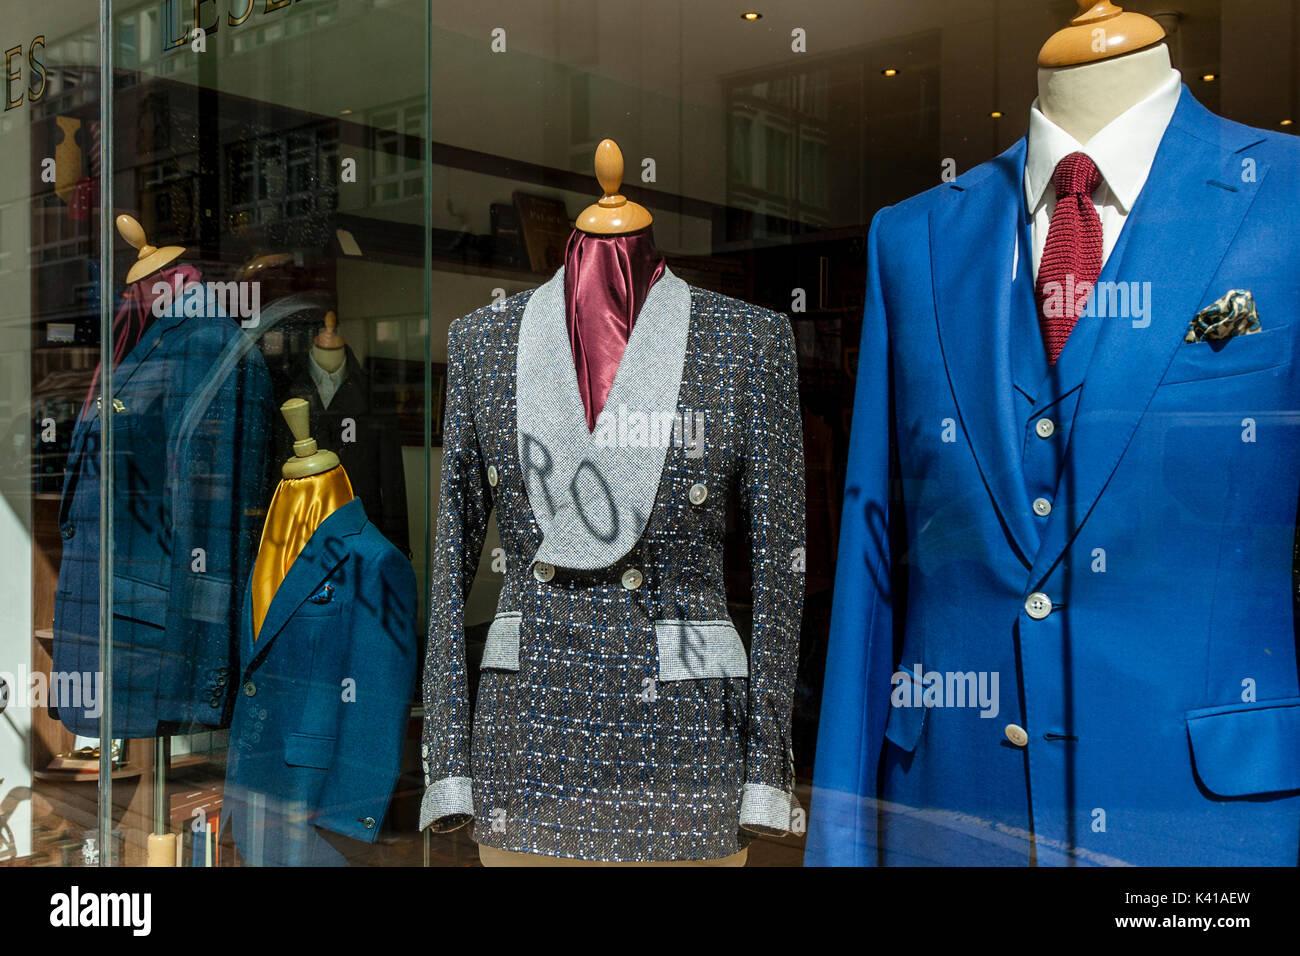 Suits On Display In A Savile Row Shop Window, Savile Row, London, UK - Stock Image